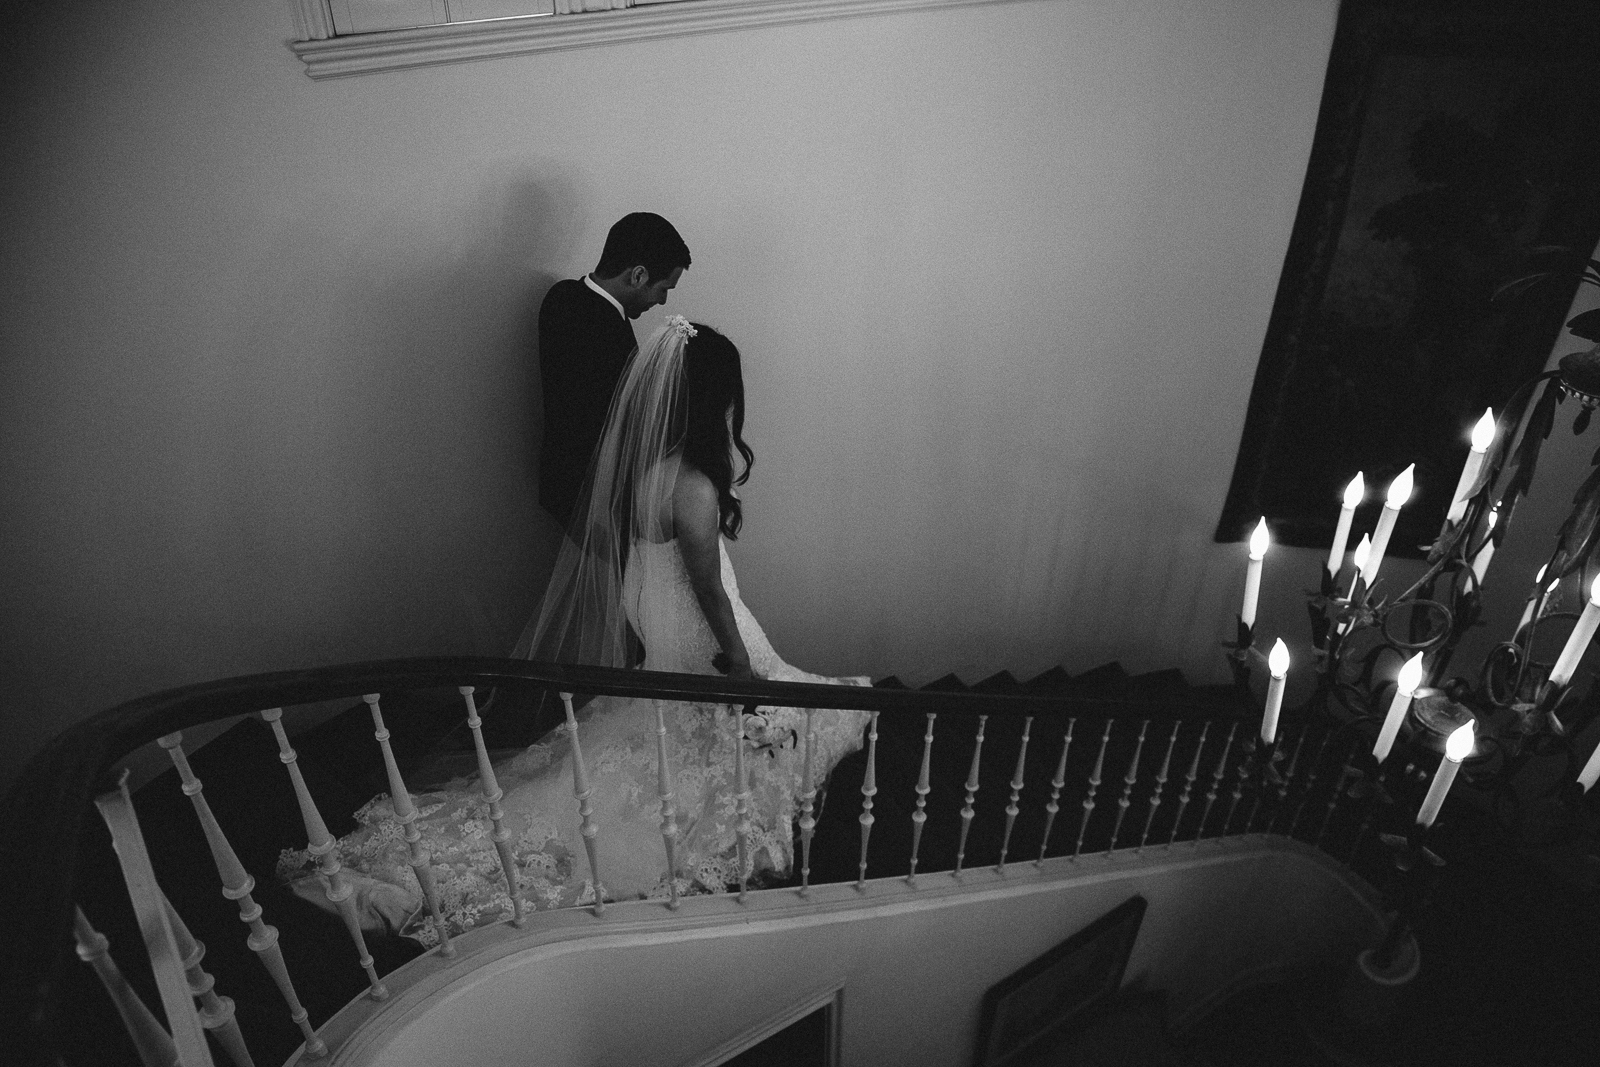 Amanda_&_Steve_Wedding_Darlington_House_La_Jolla_2015_IMG_6913.JPG